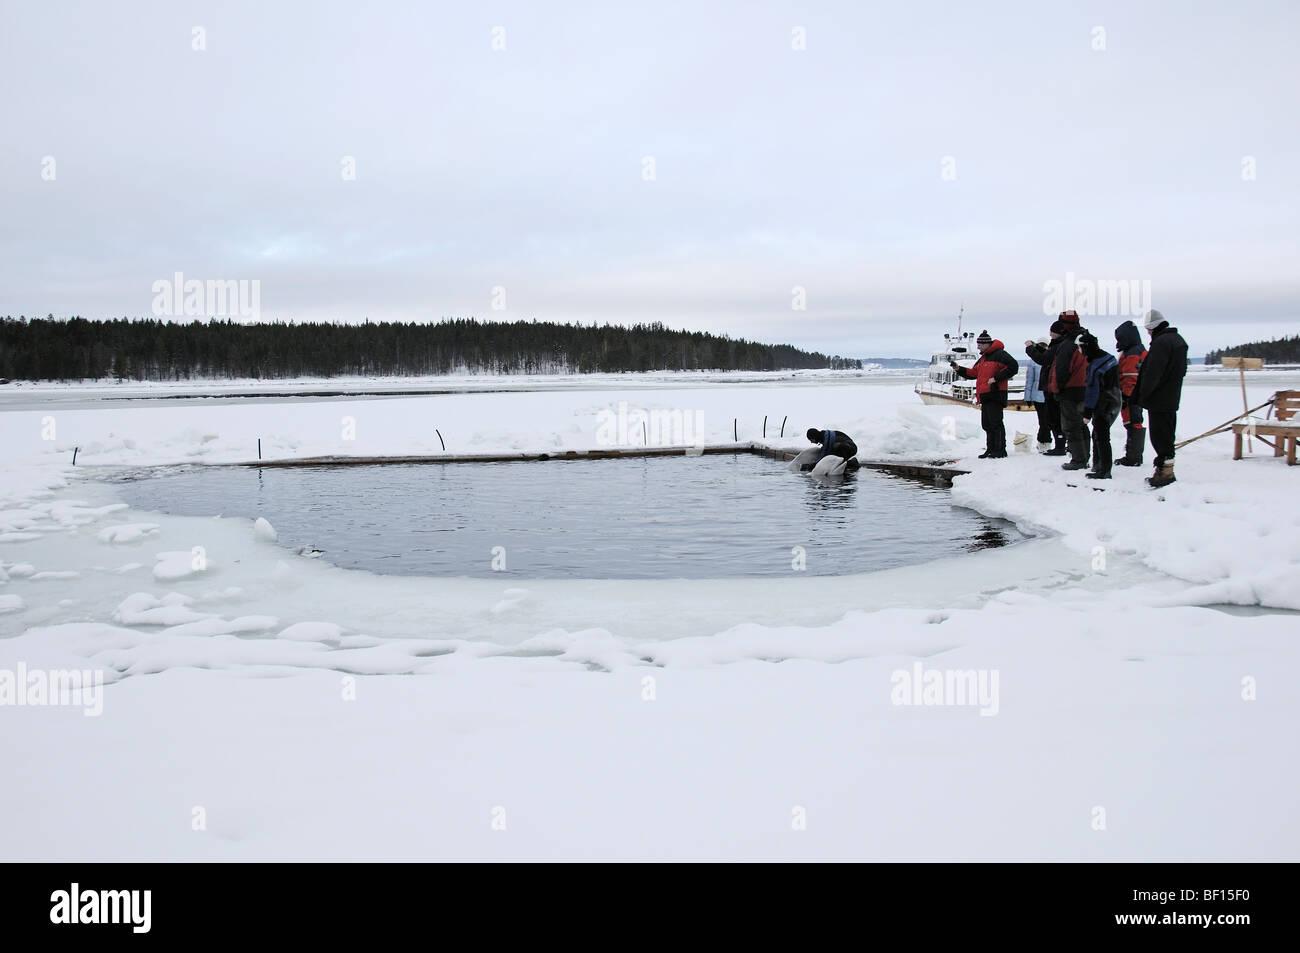 Delphinapterus leucas, White Whale, Beluga, Outdoor Delphinarium, belukha, Sea Canary, White Sea, Russia Stock Photo